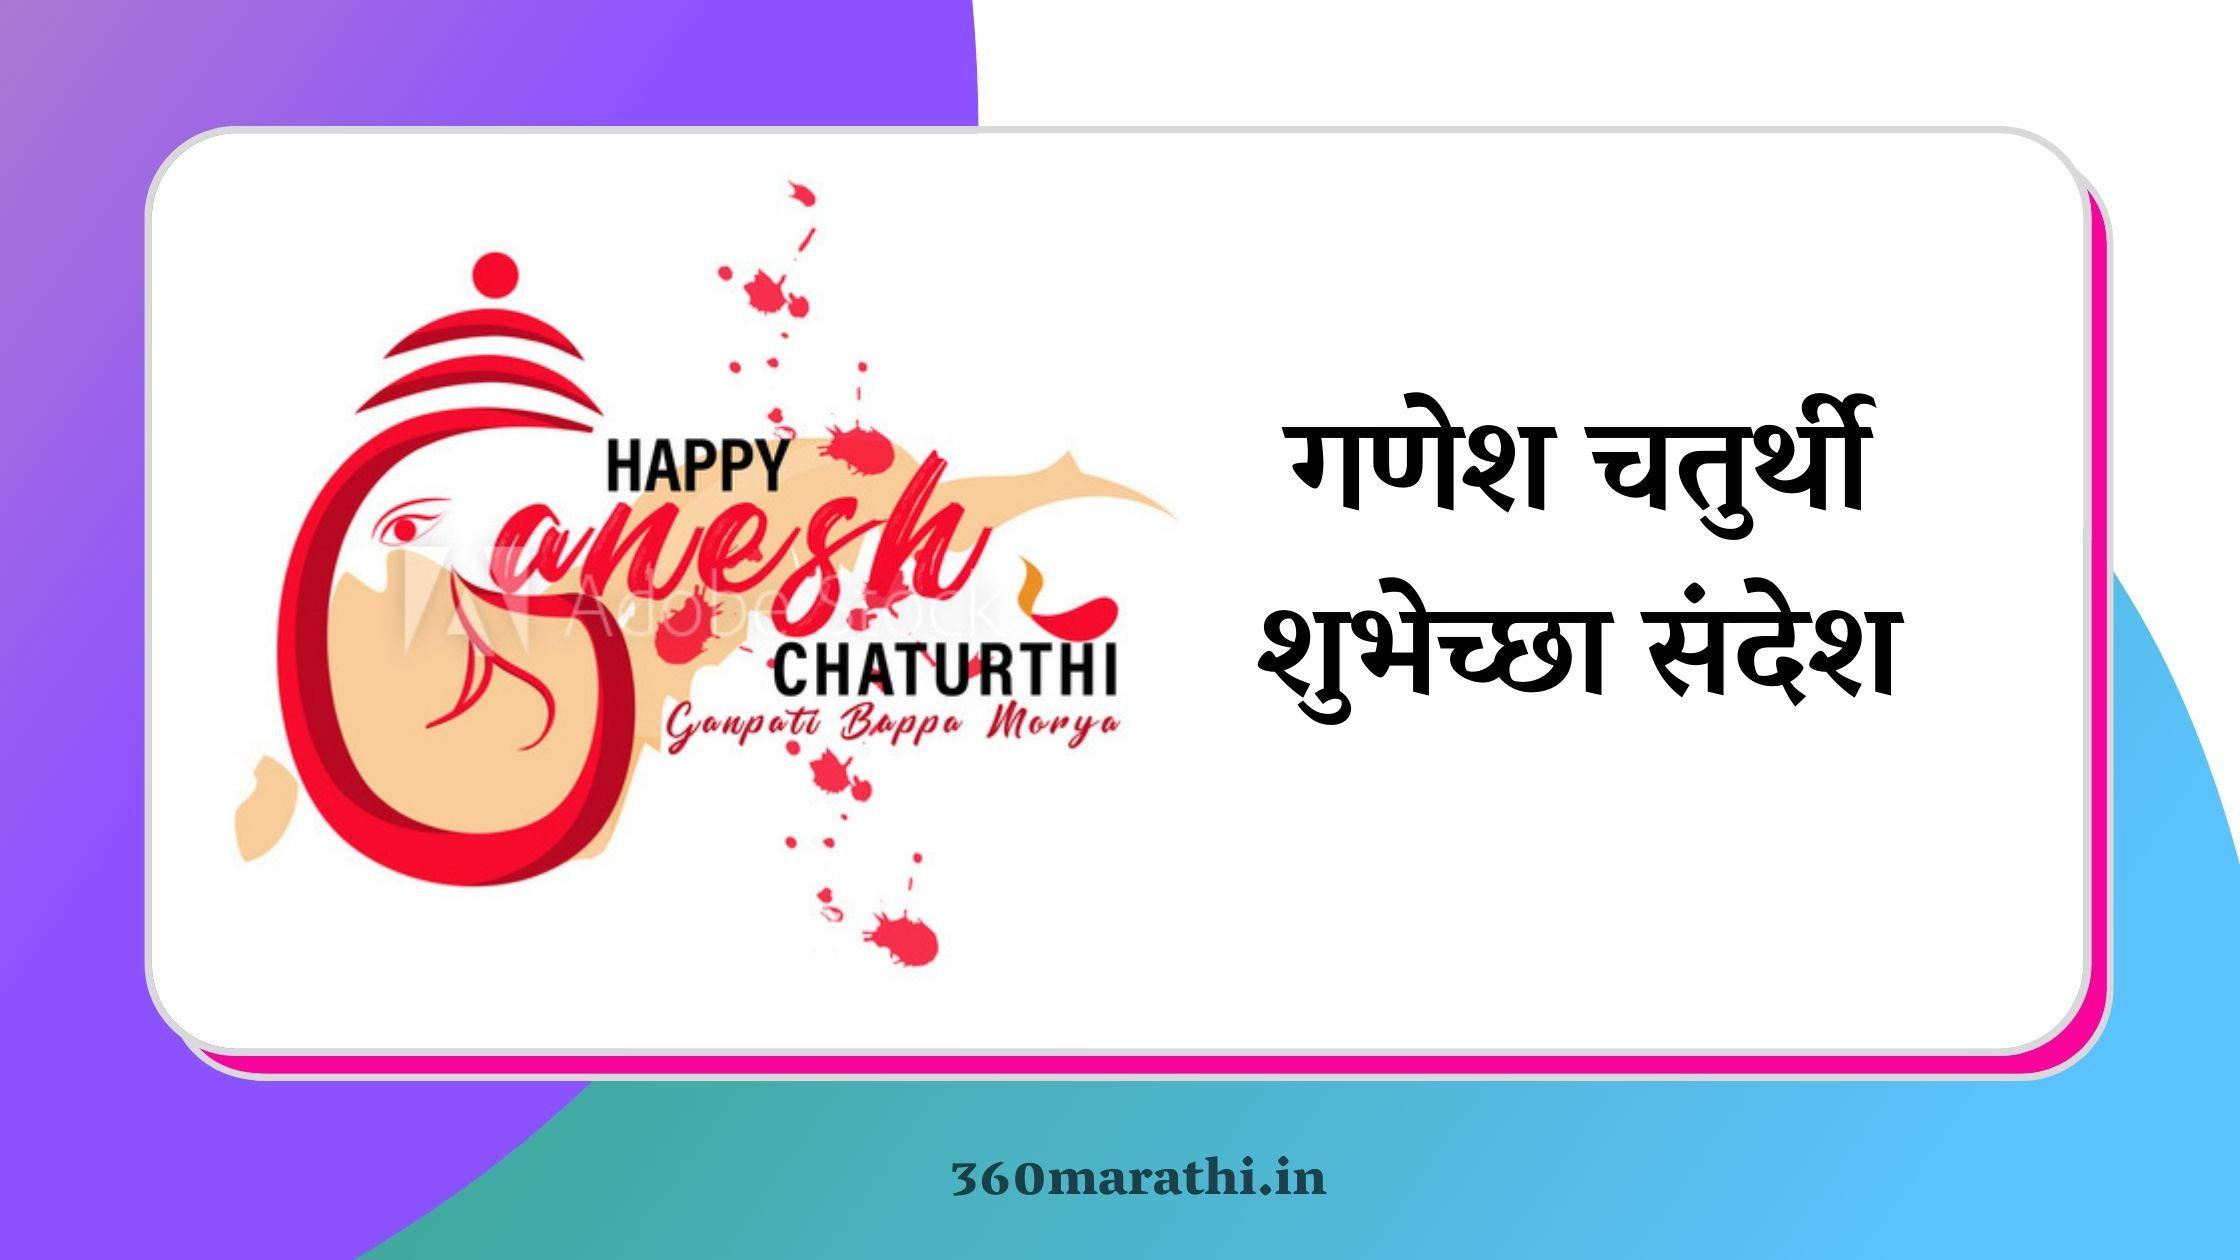 गणेश चतुर्थी शुभेच्छा संदेश मराठी | Ganesh Chaturthi Marathi Status, Shayari, Wishes, Quotes, SMS, Banner